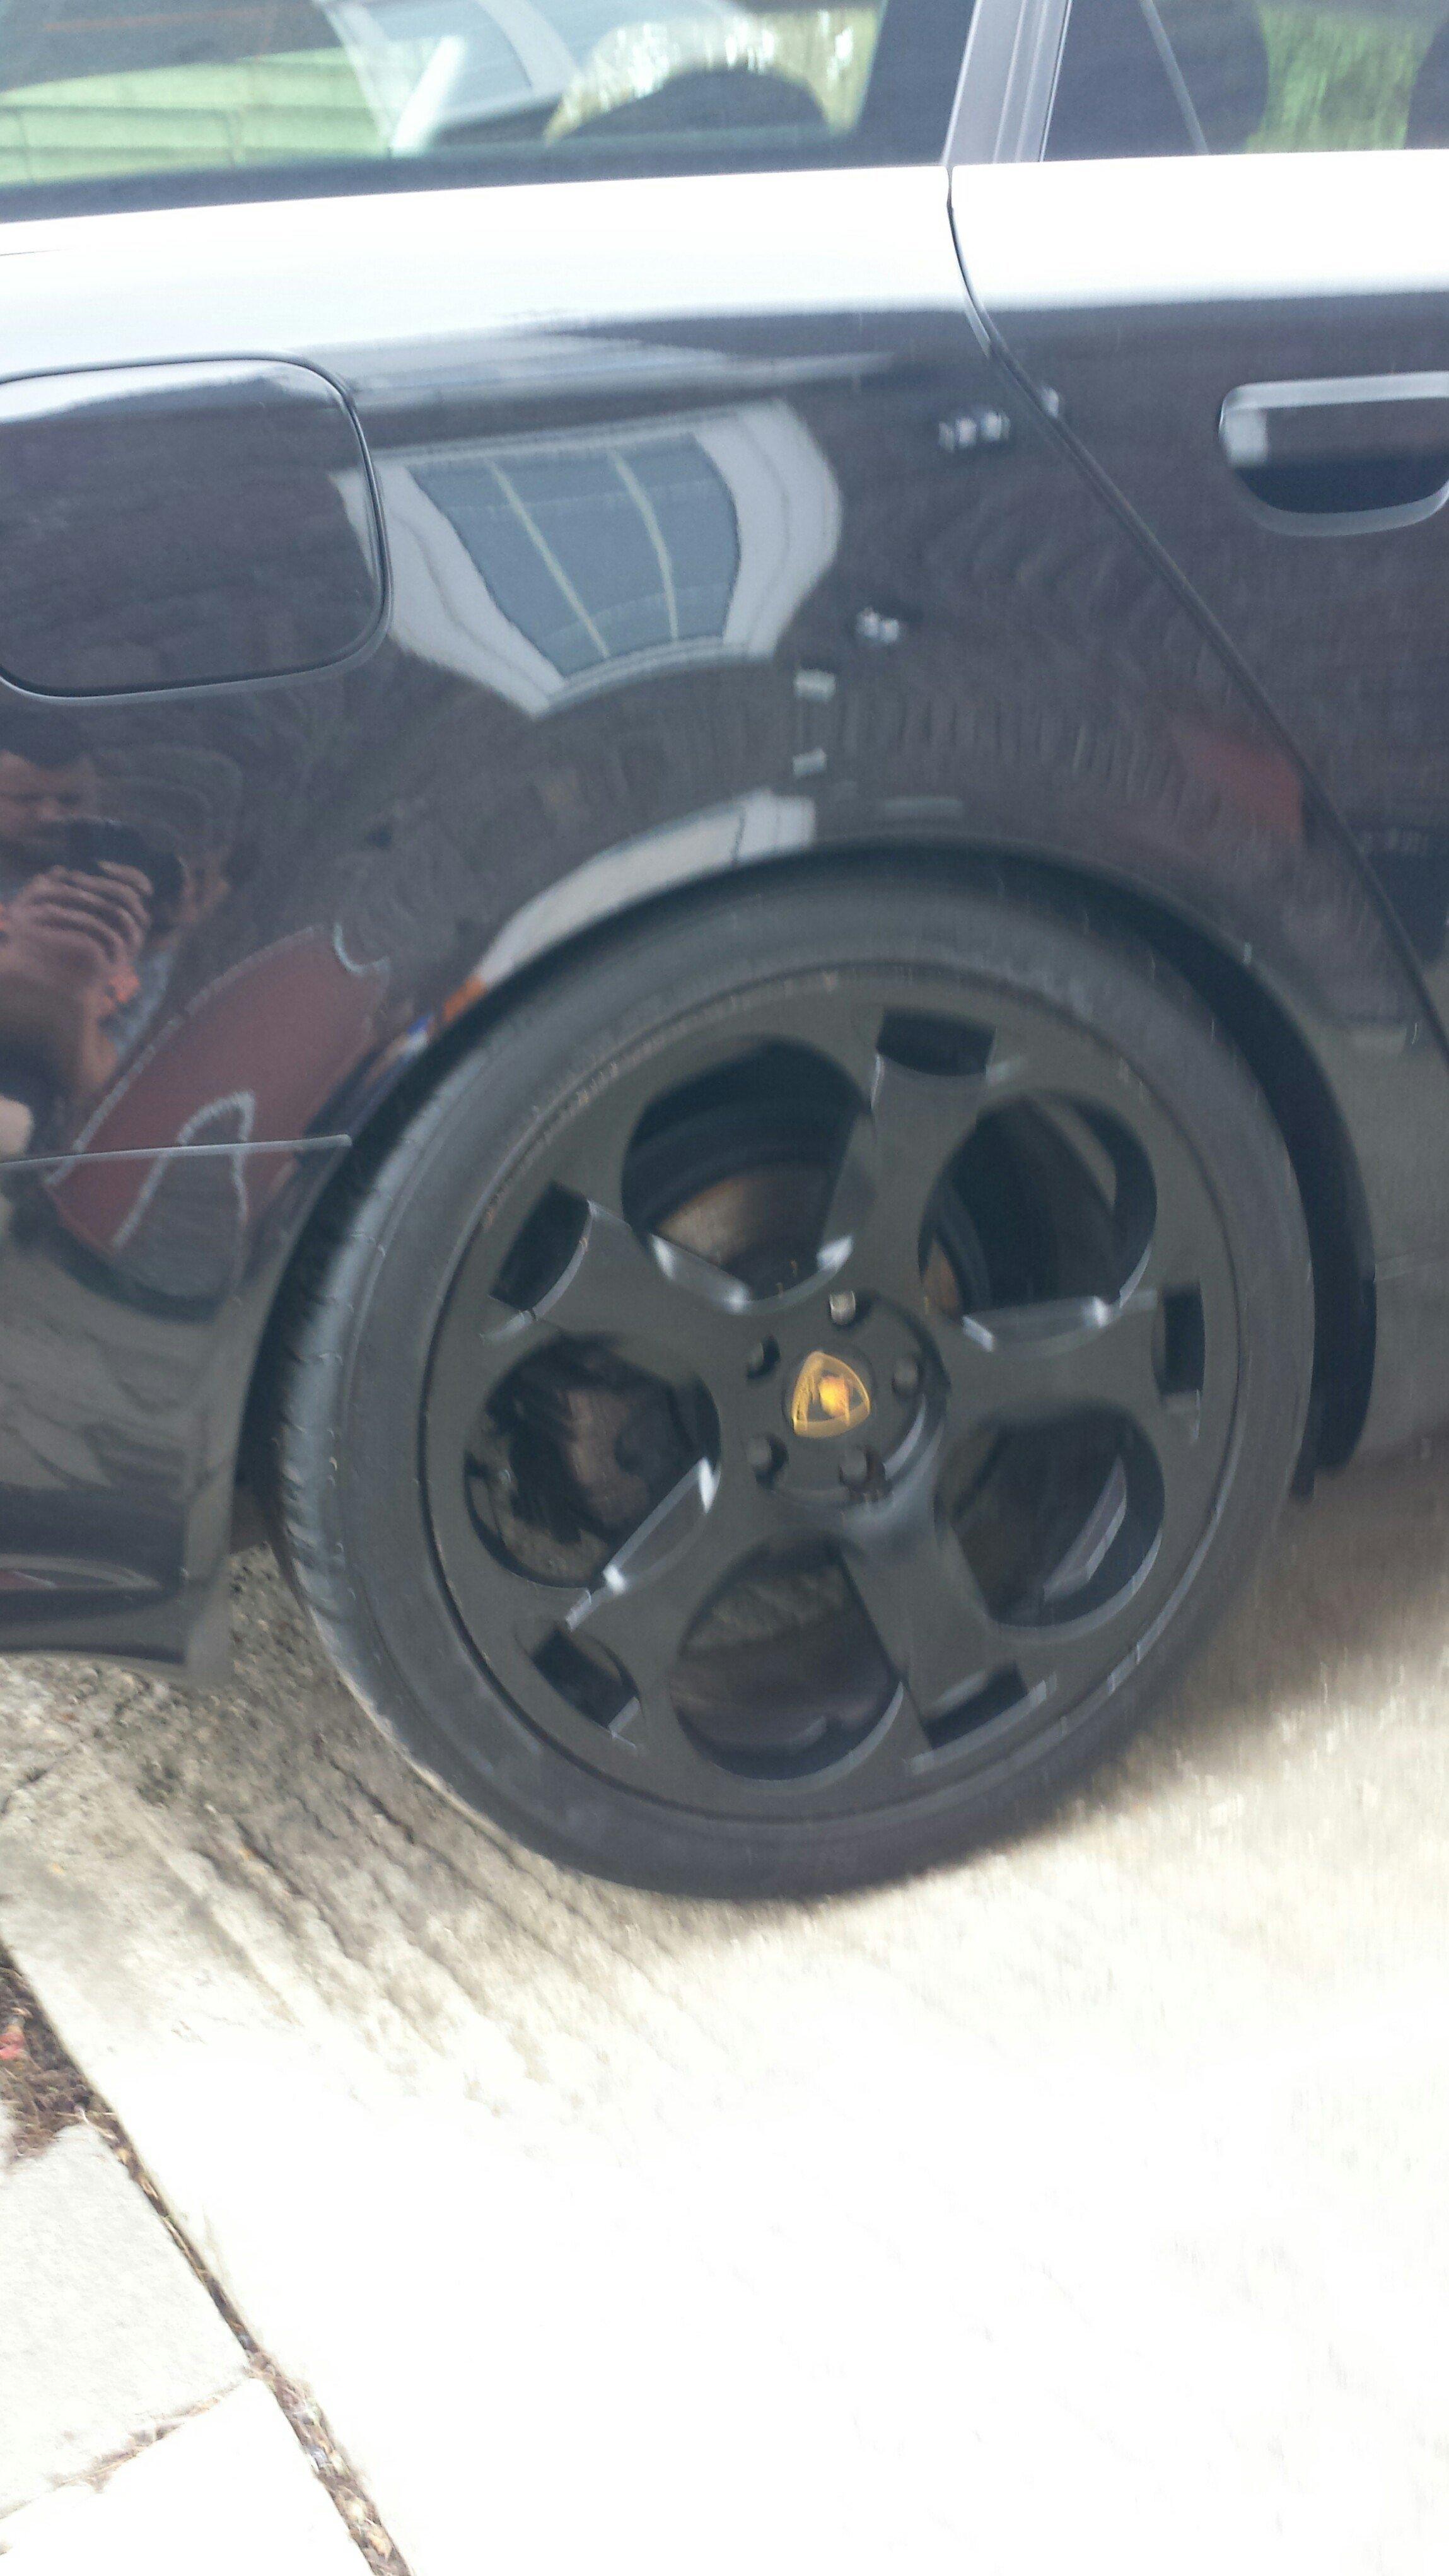 gallardo wheels resized 2 .jpg